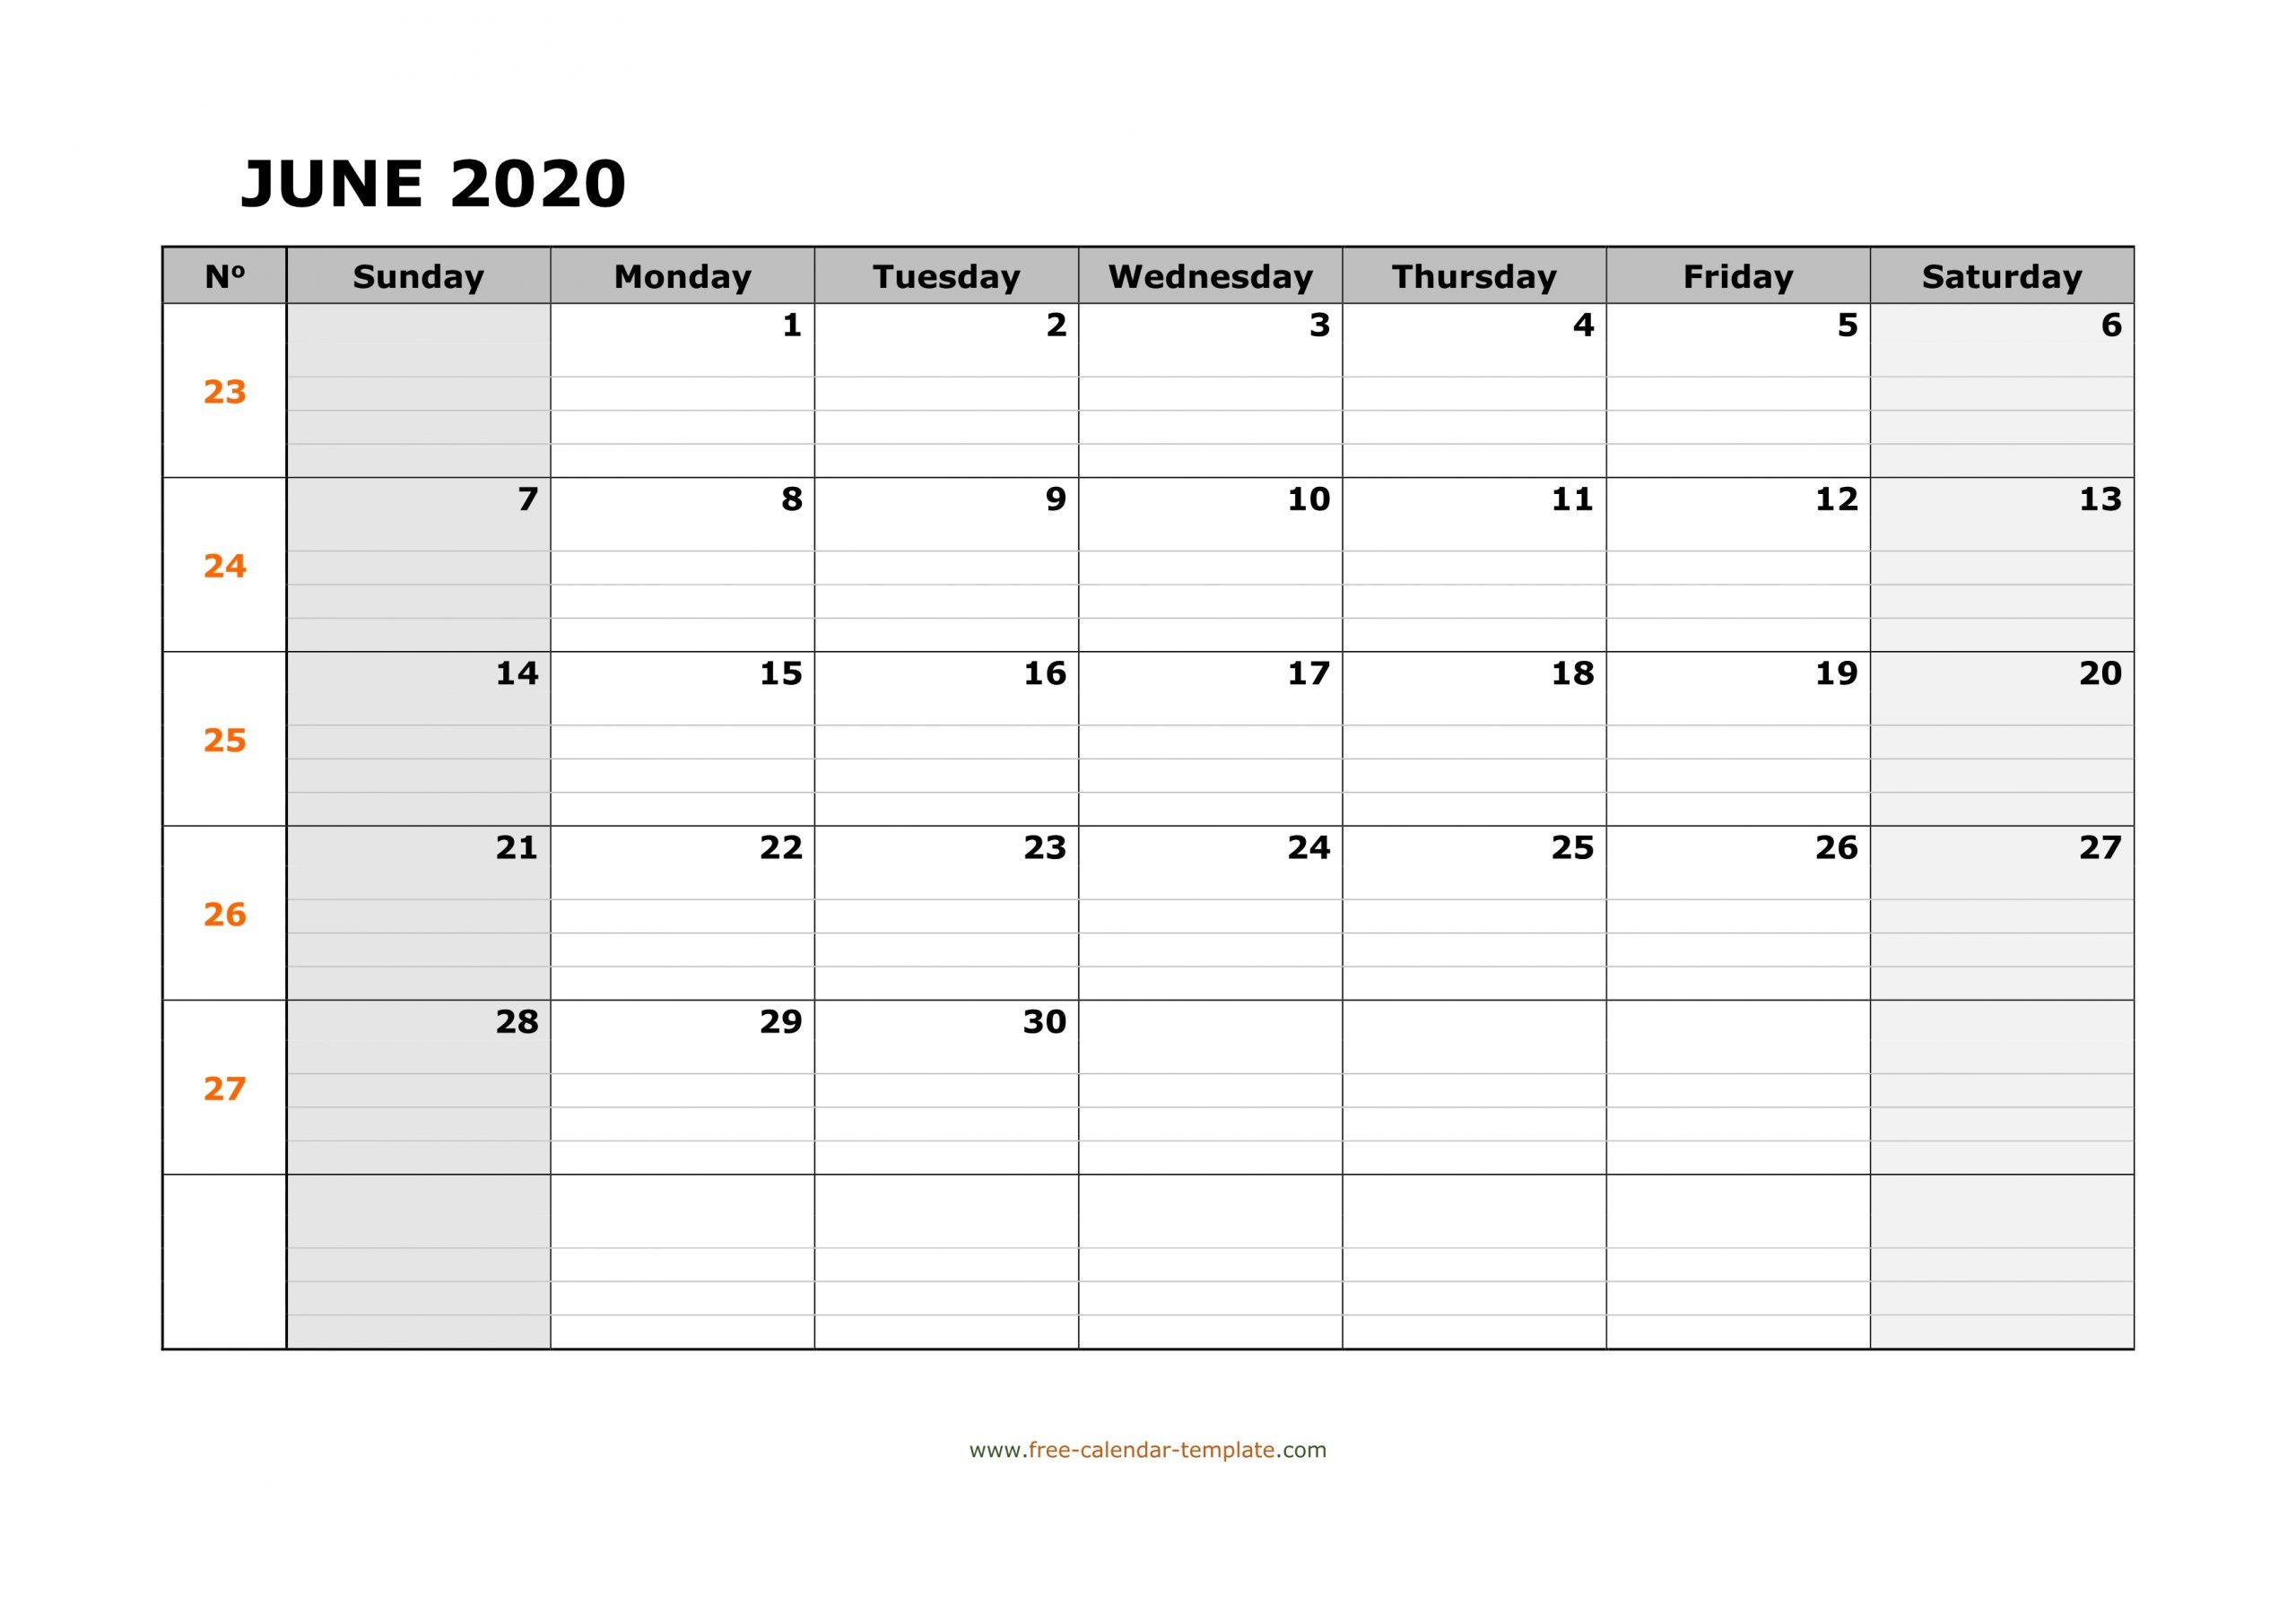 June 2020 Calendar Free Printable With Grid Lines Designed